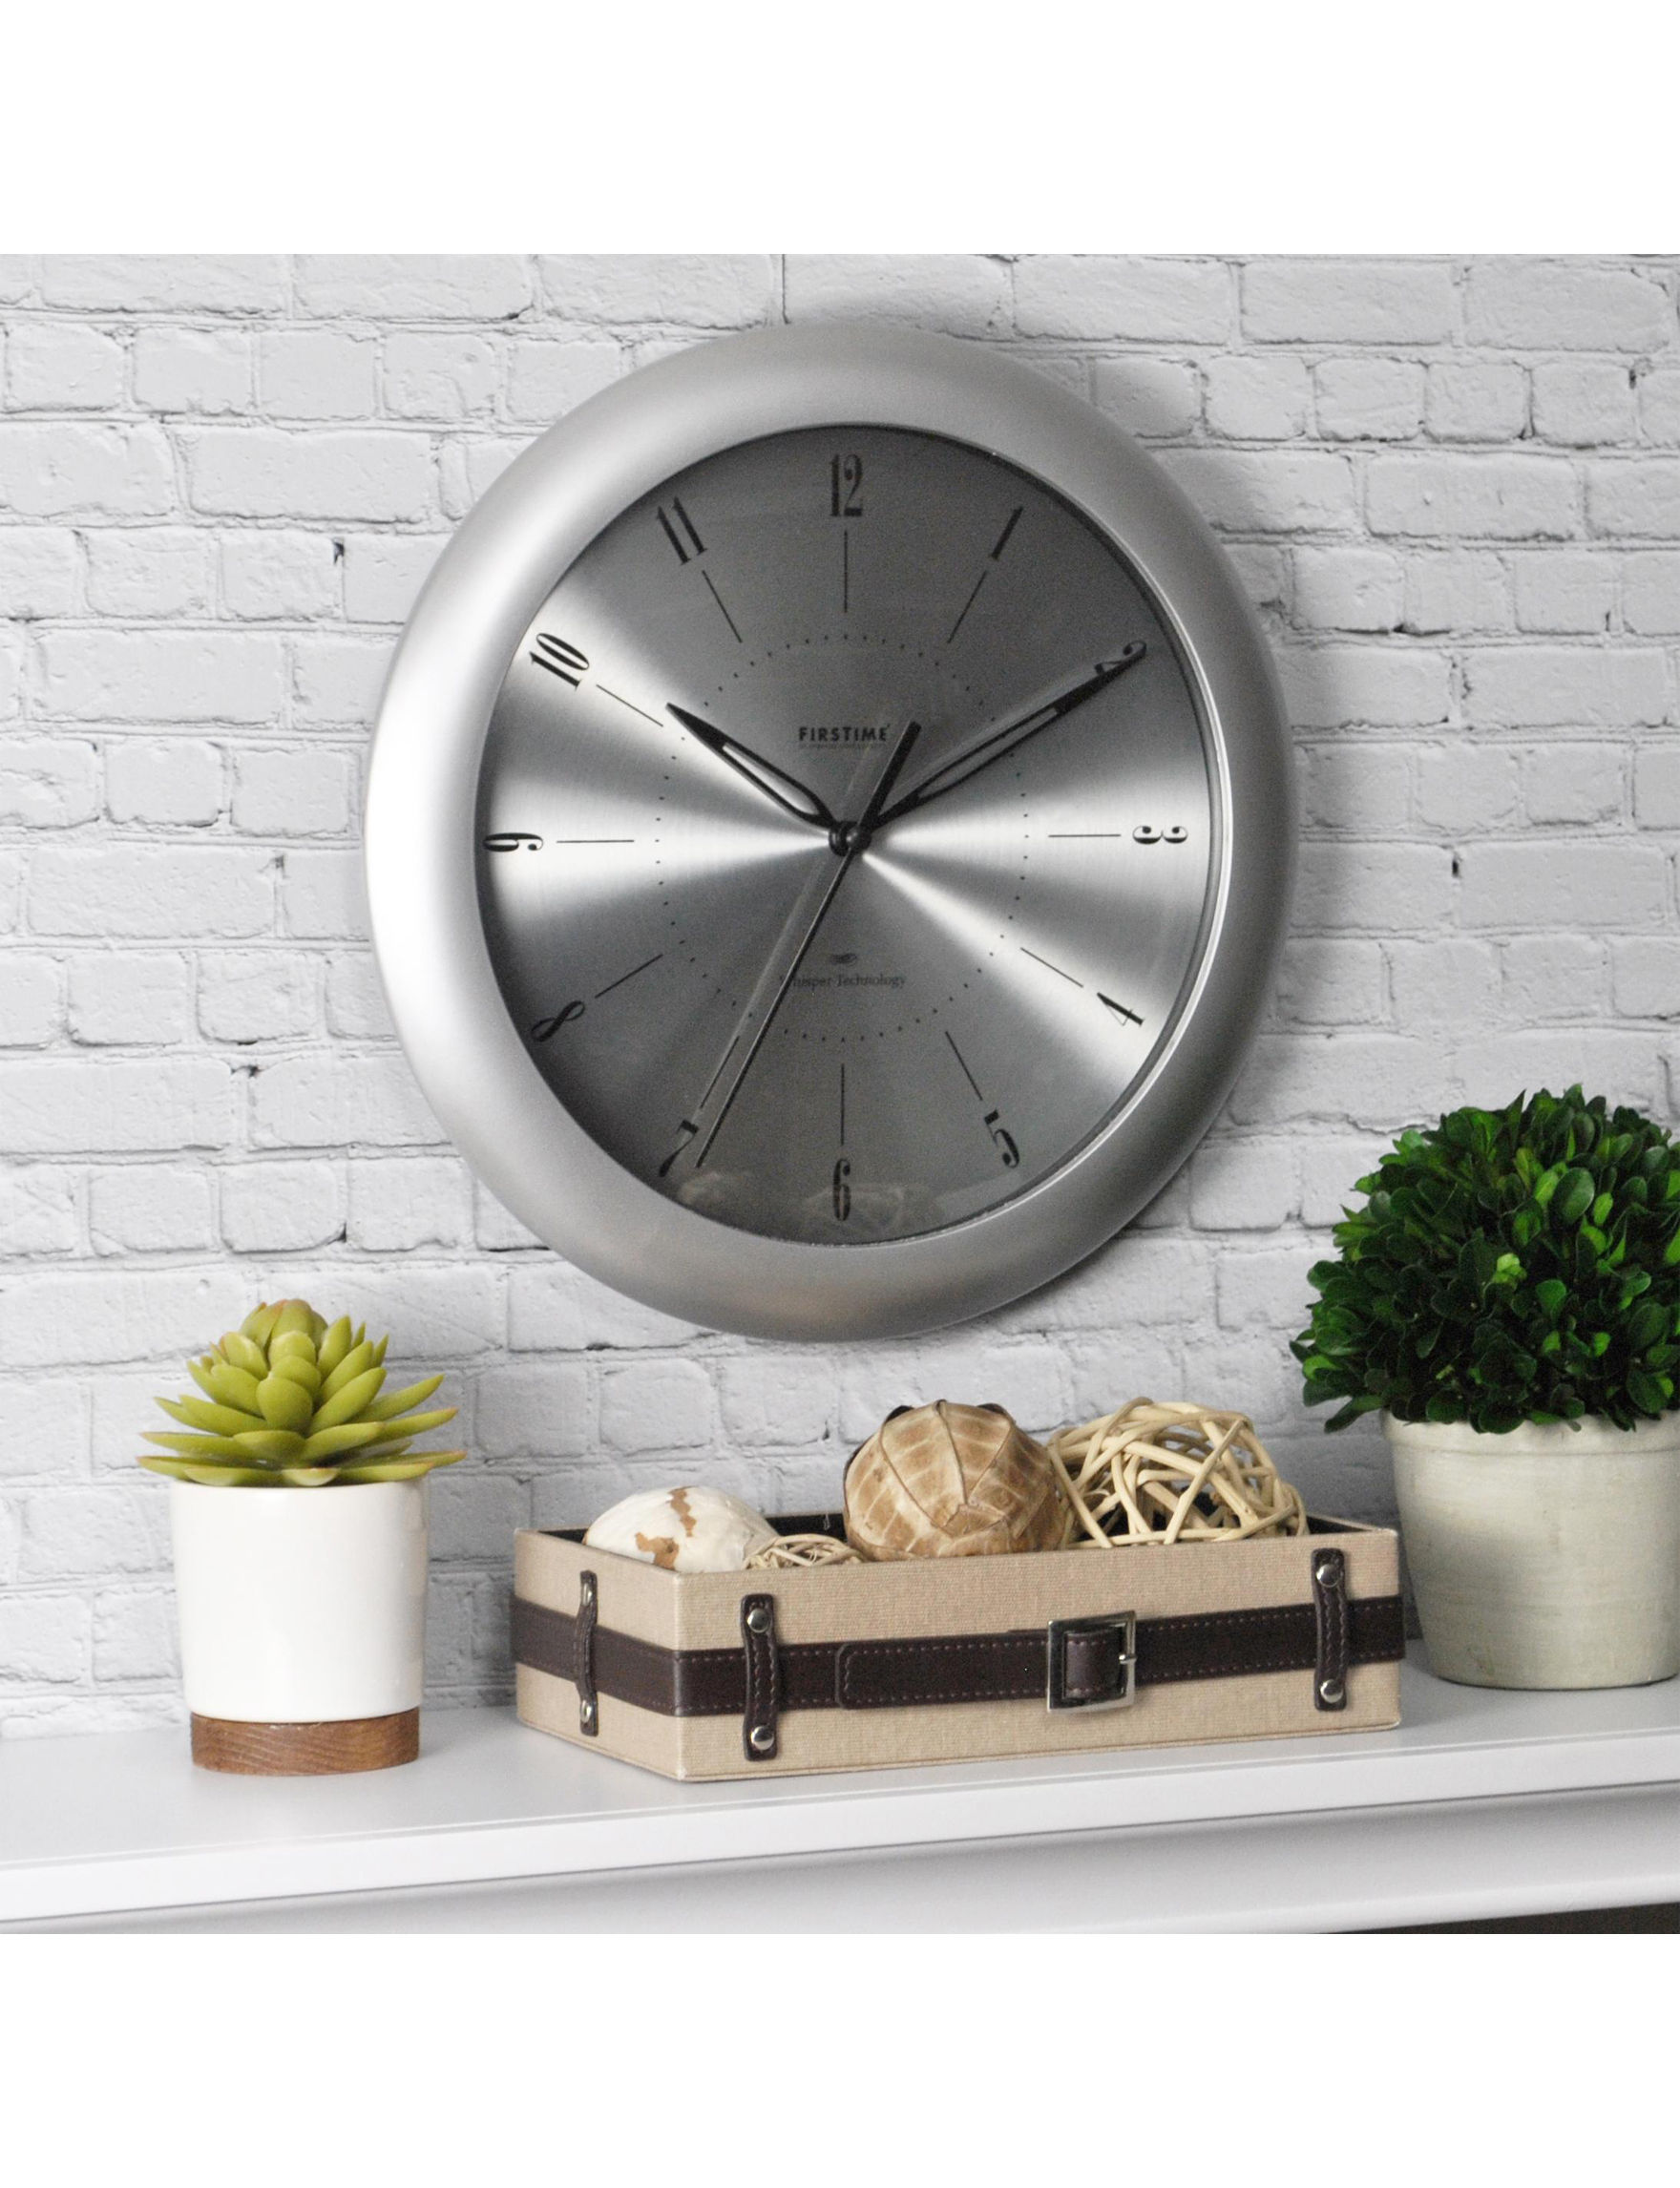 Firstime Manufactory Silver Wall Clocks Wall Decor